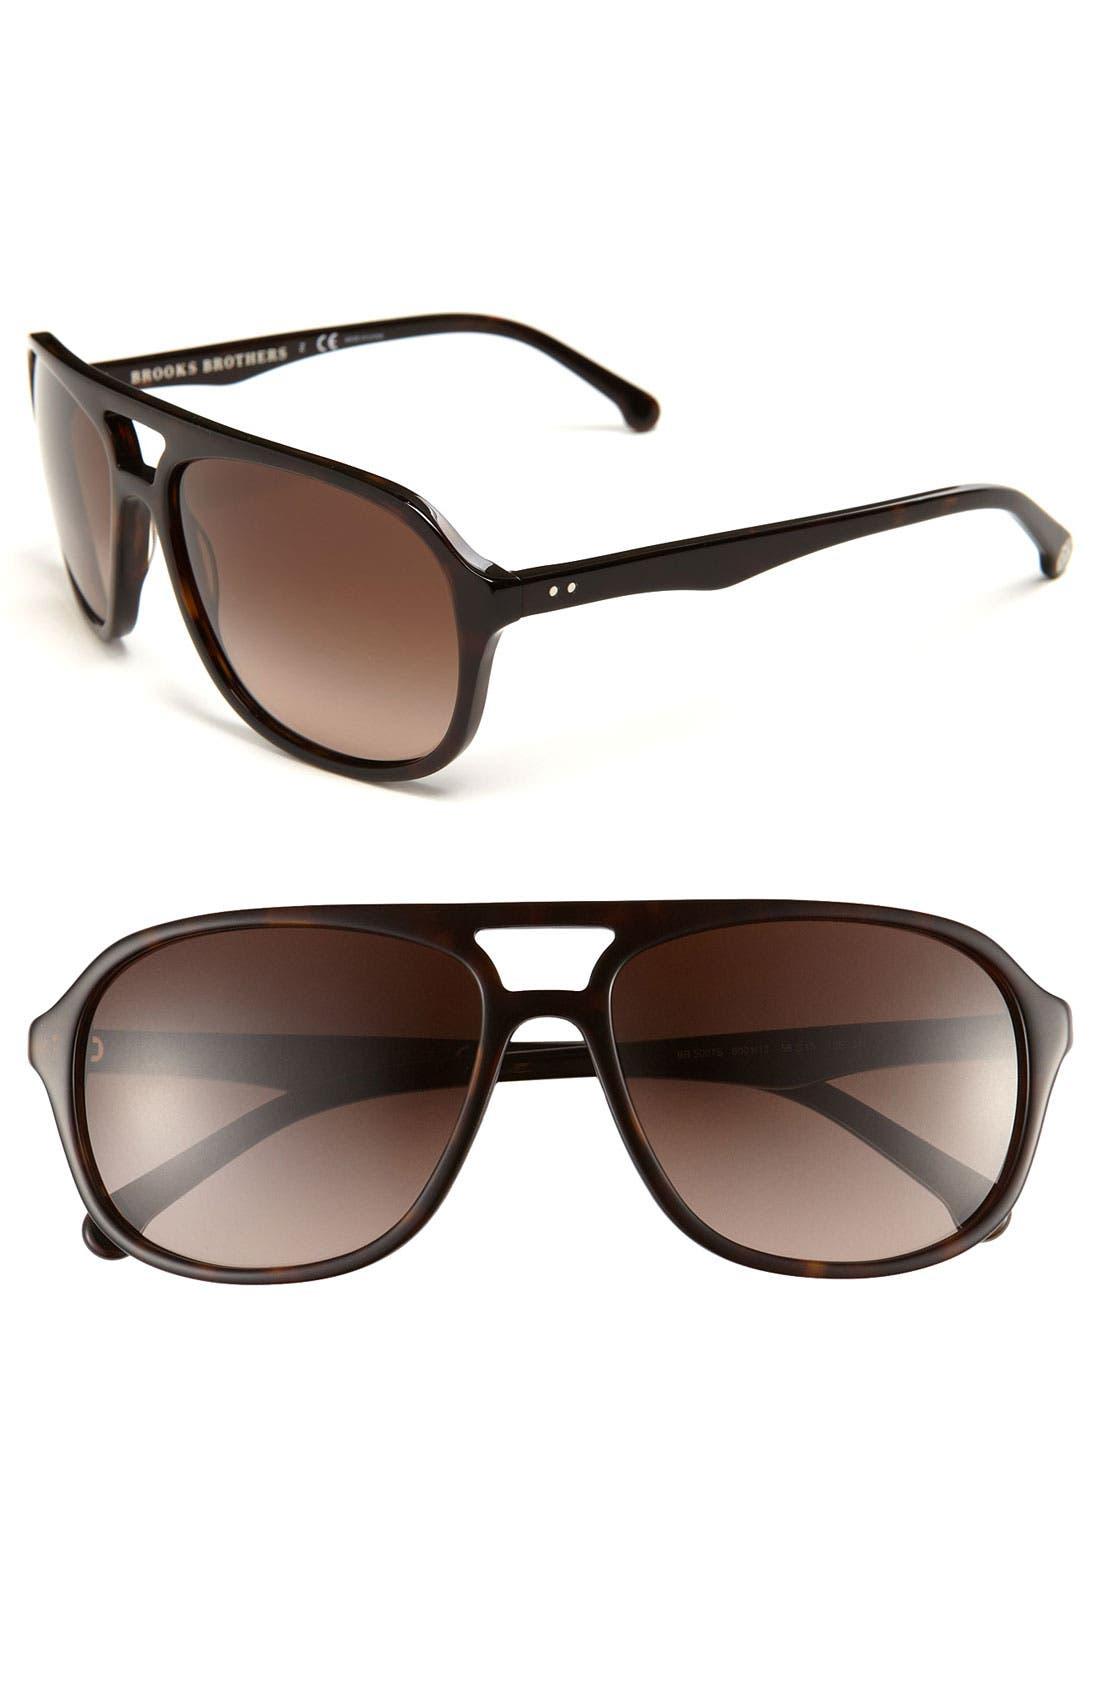 Main Image - Brooks Brothers Square 58mm Aviator Sunglasses